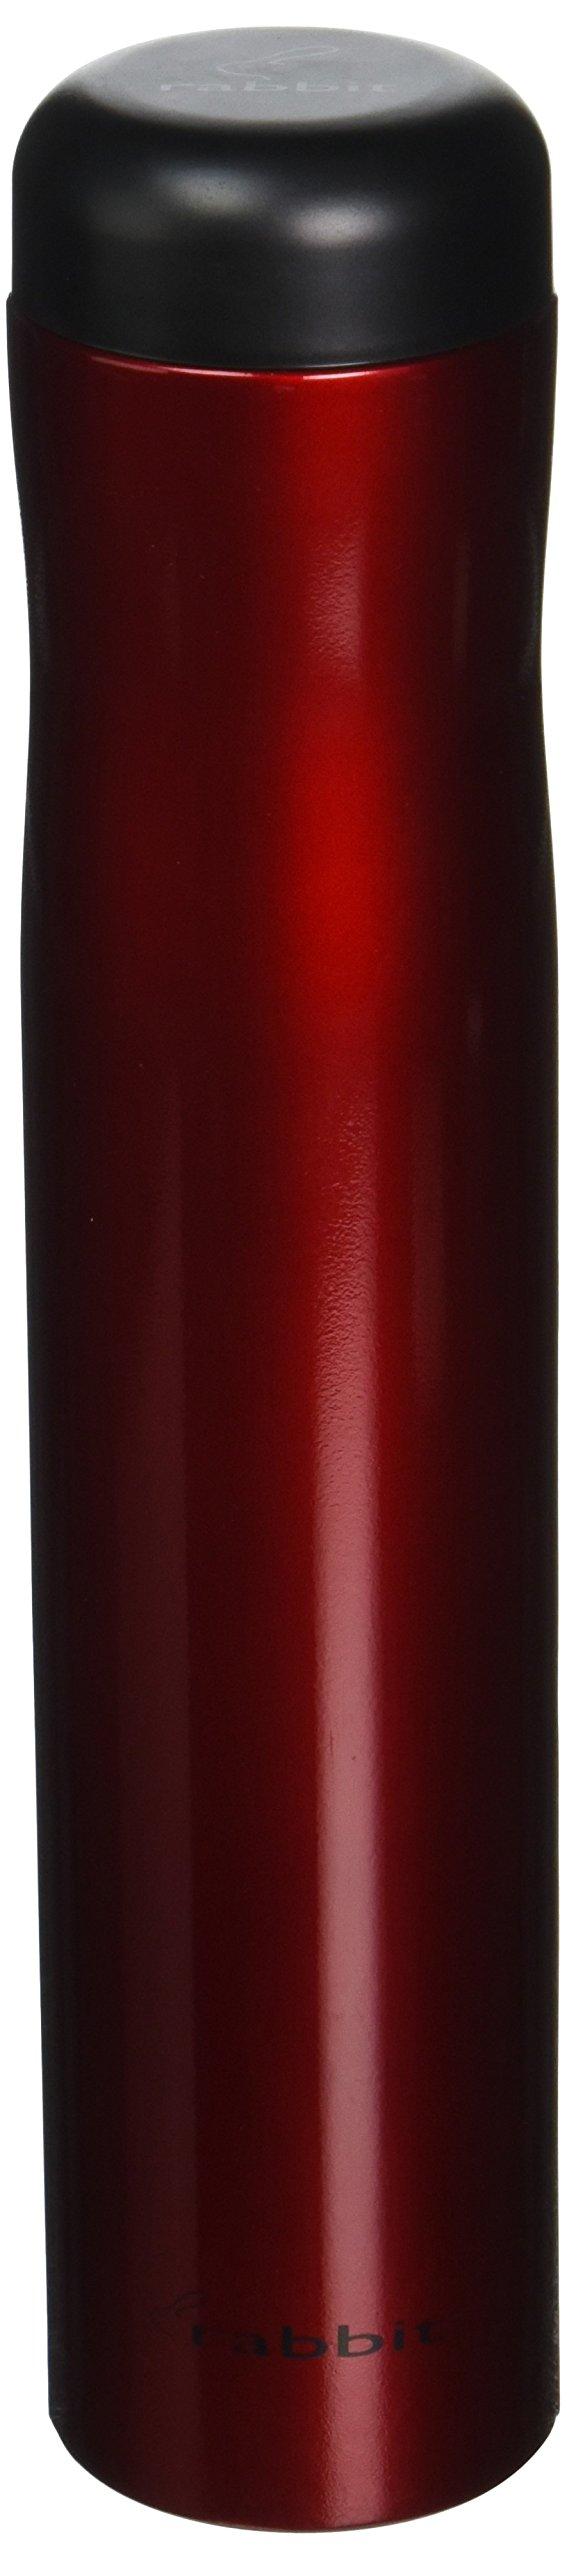 Rabbit Automatic Electric Corkscrew Wine Bottle Opener (Metallic Red)